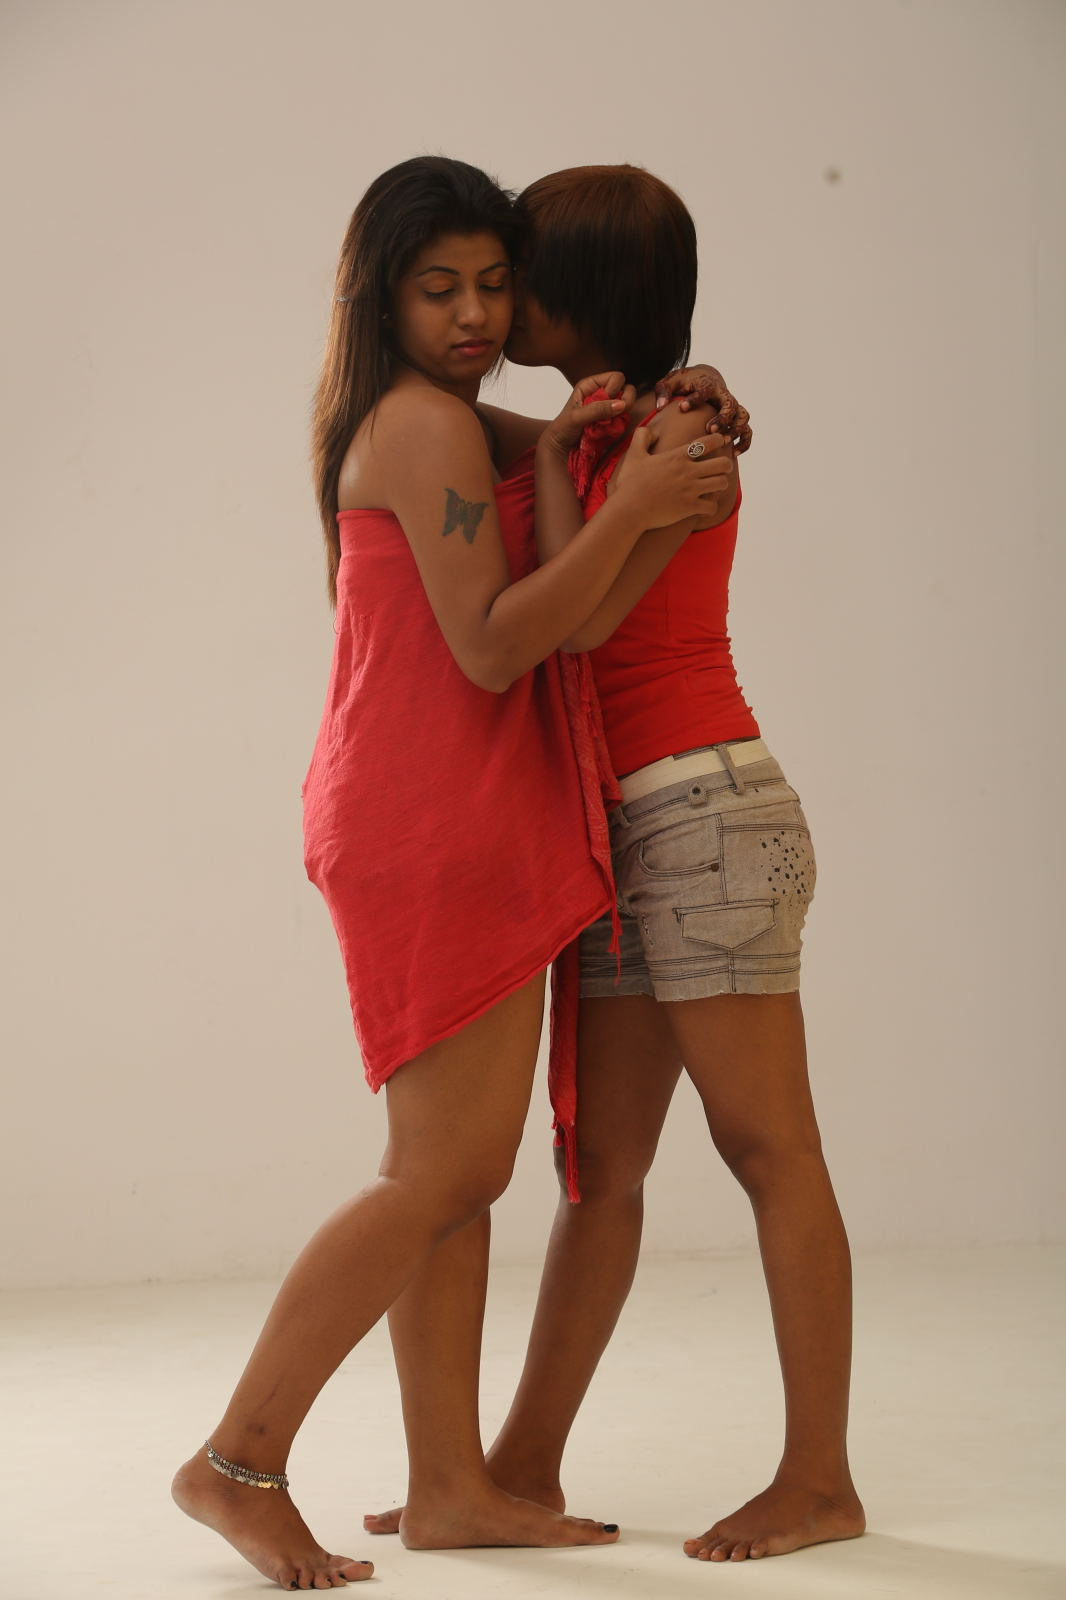 Hd Wallpaper Of Beautiful Indian Girl Telugu Movie Affair Hot Photo Shoot Hd Latest Tamil